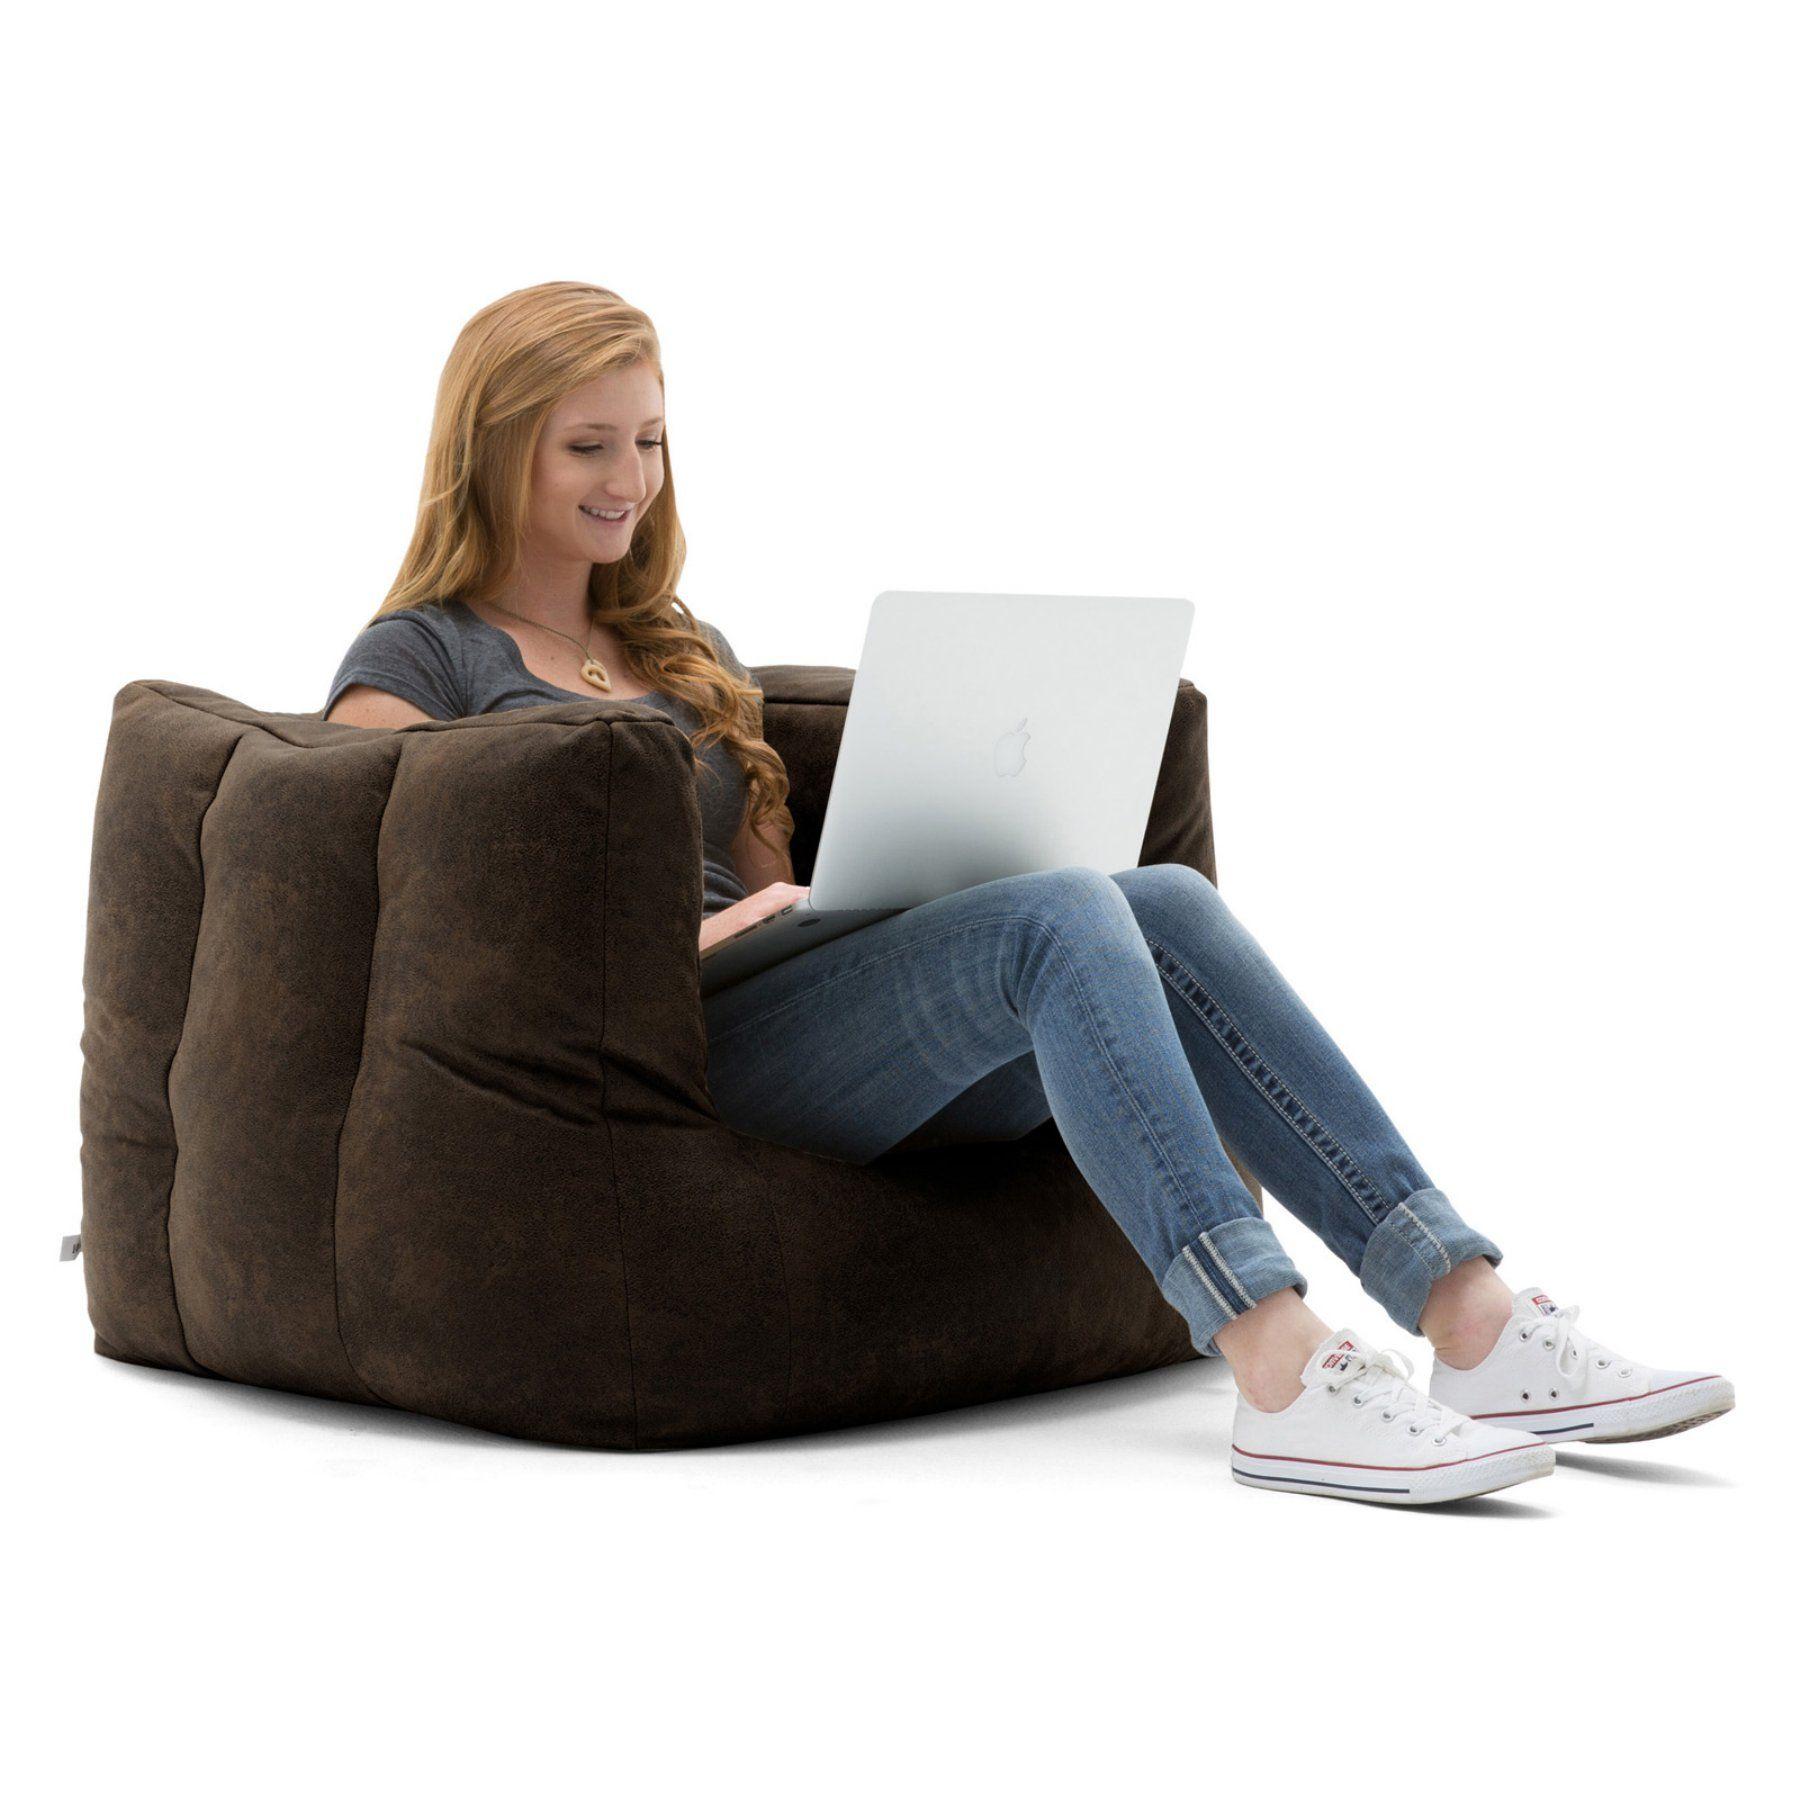 Astounding Lux By Big Joe Cube Blazer Leather Bean Bag 669405 Evergreenethics Interior Chair Design Evergreenethicsorg